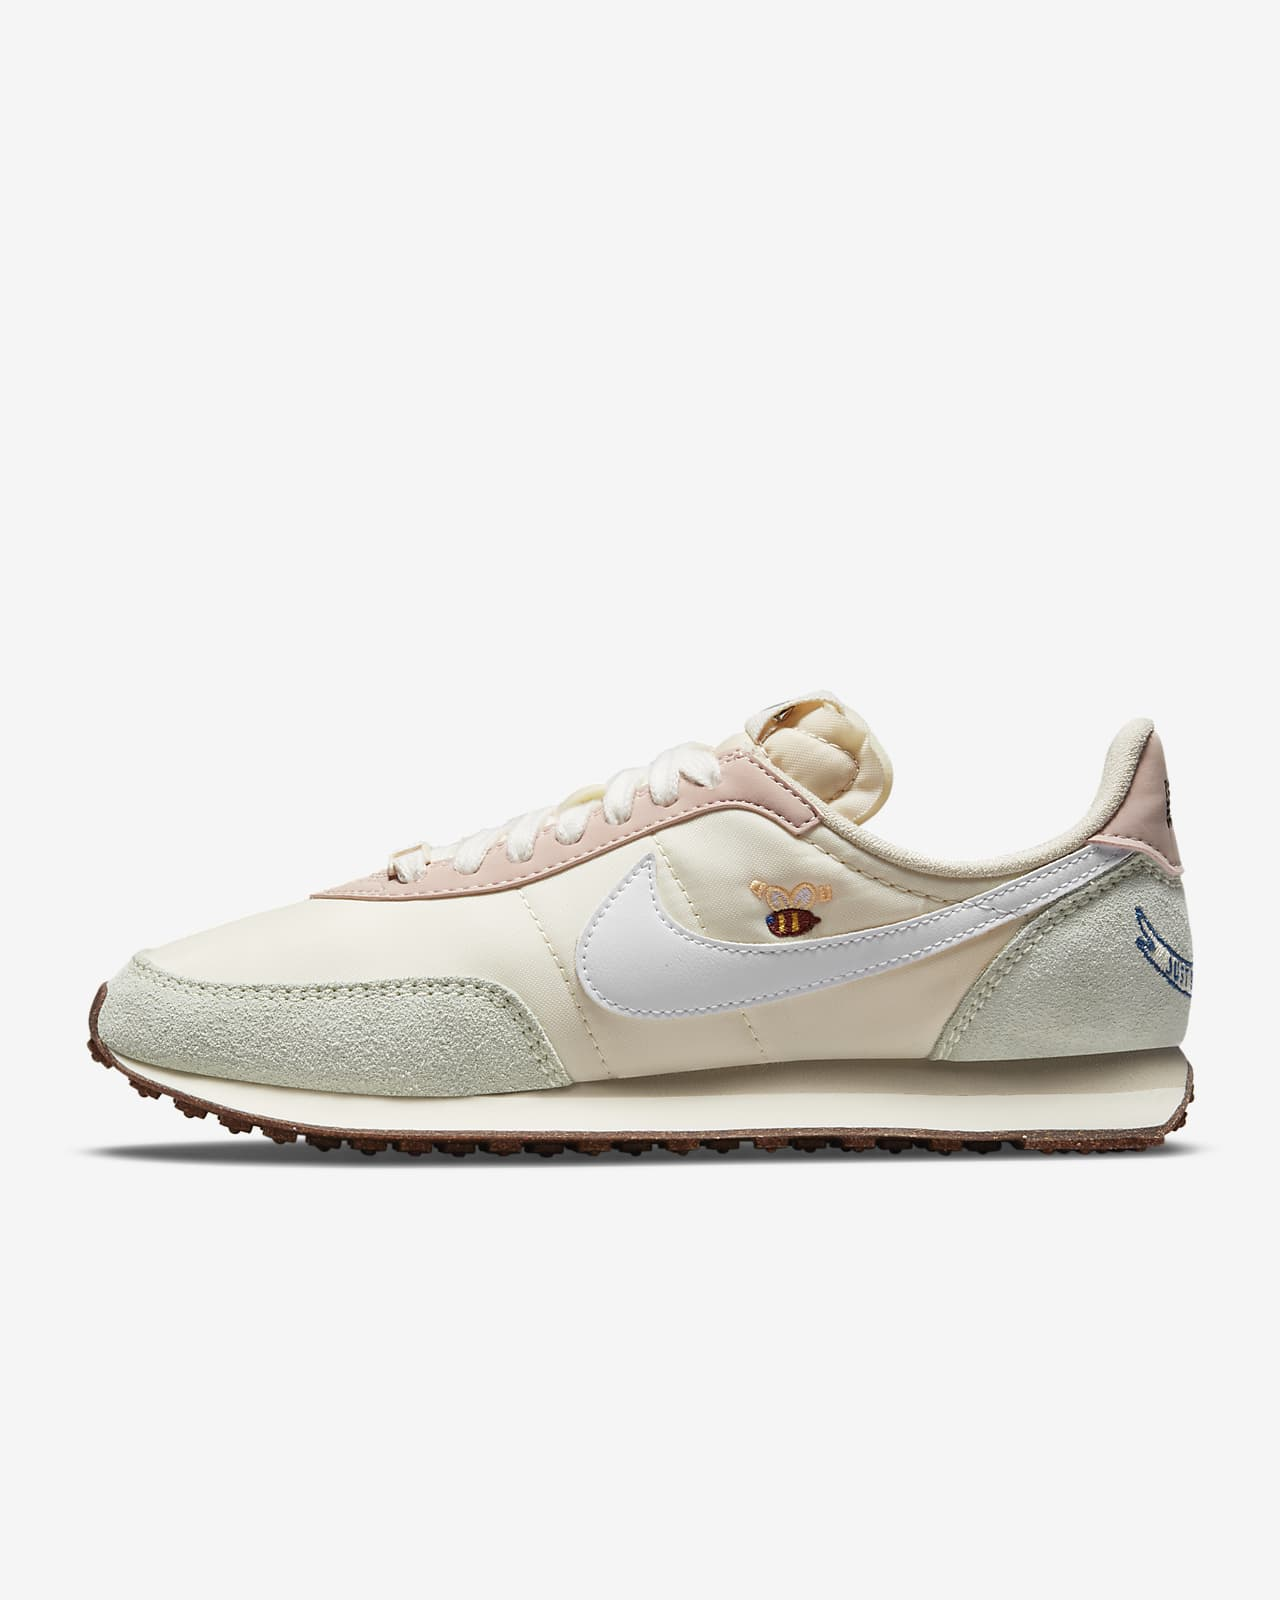 Nike Waffle Trainer 2 Women's Shoe